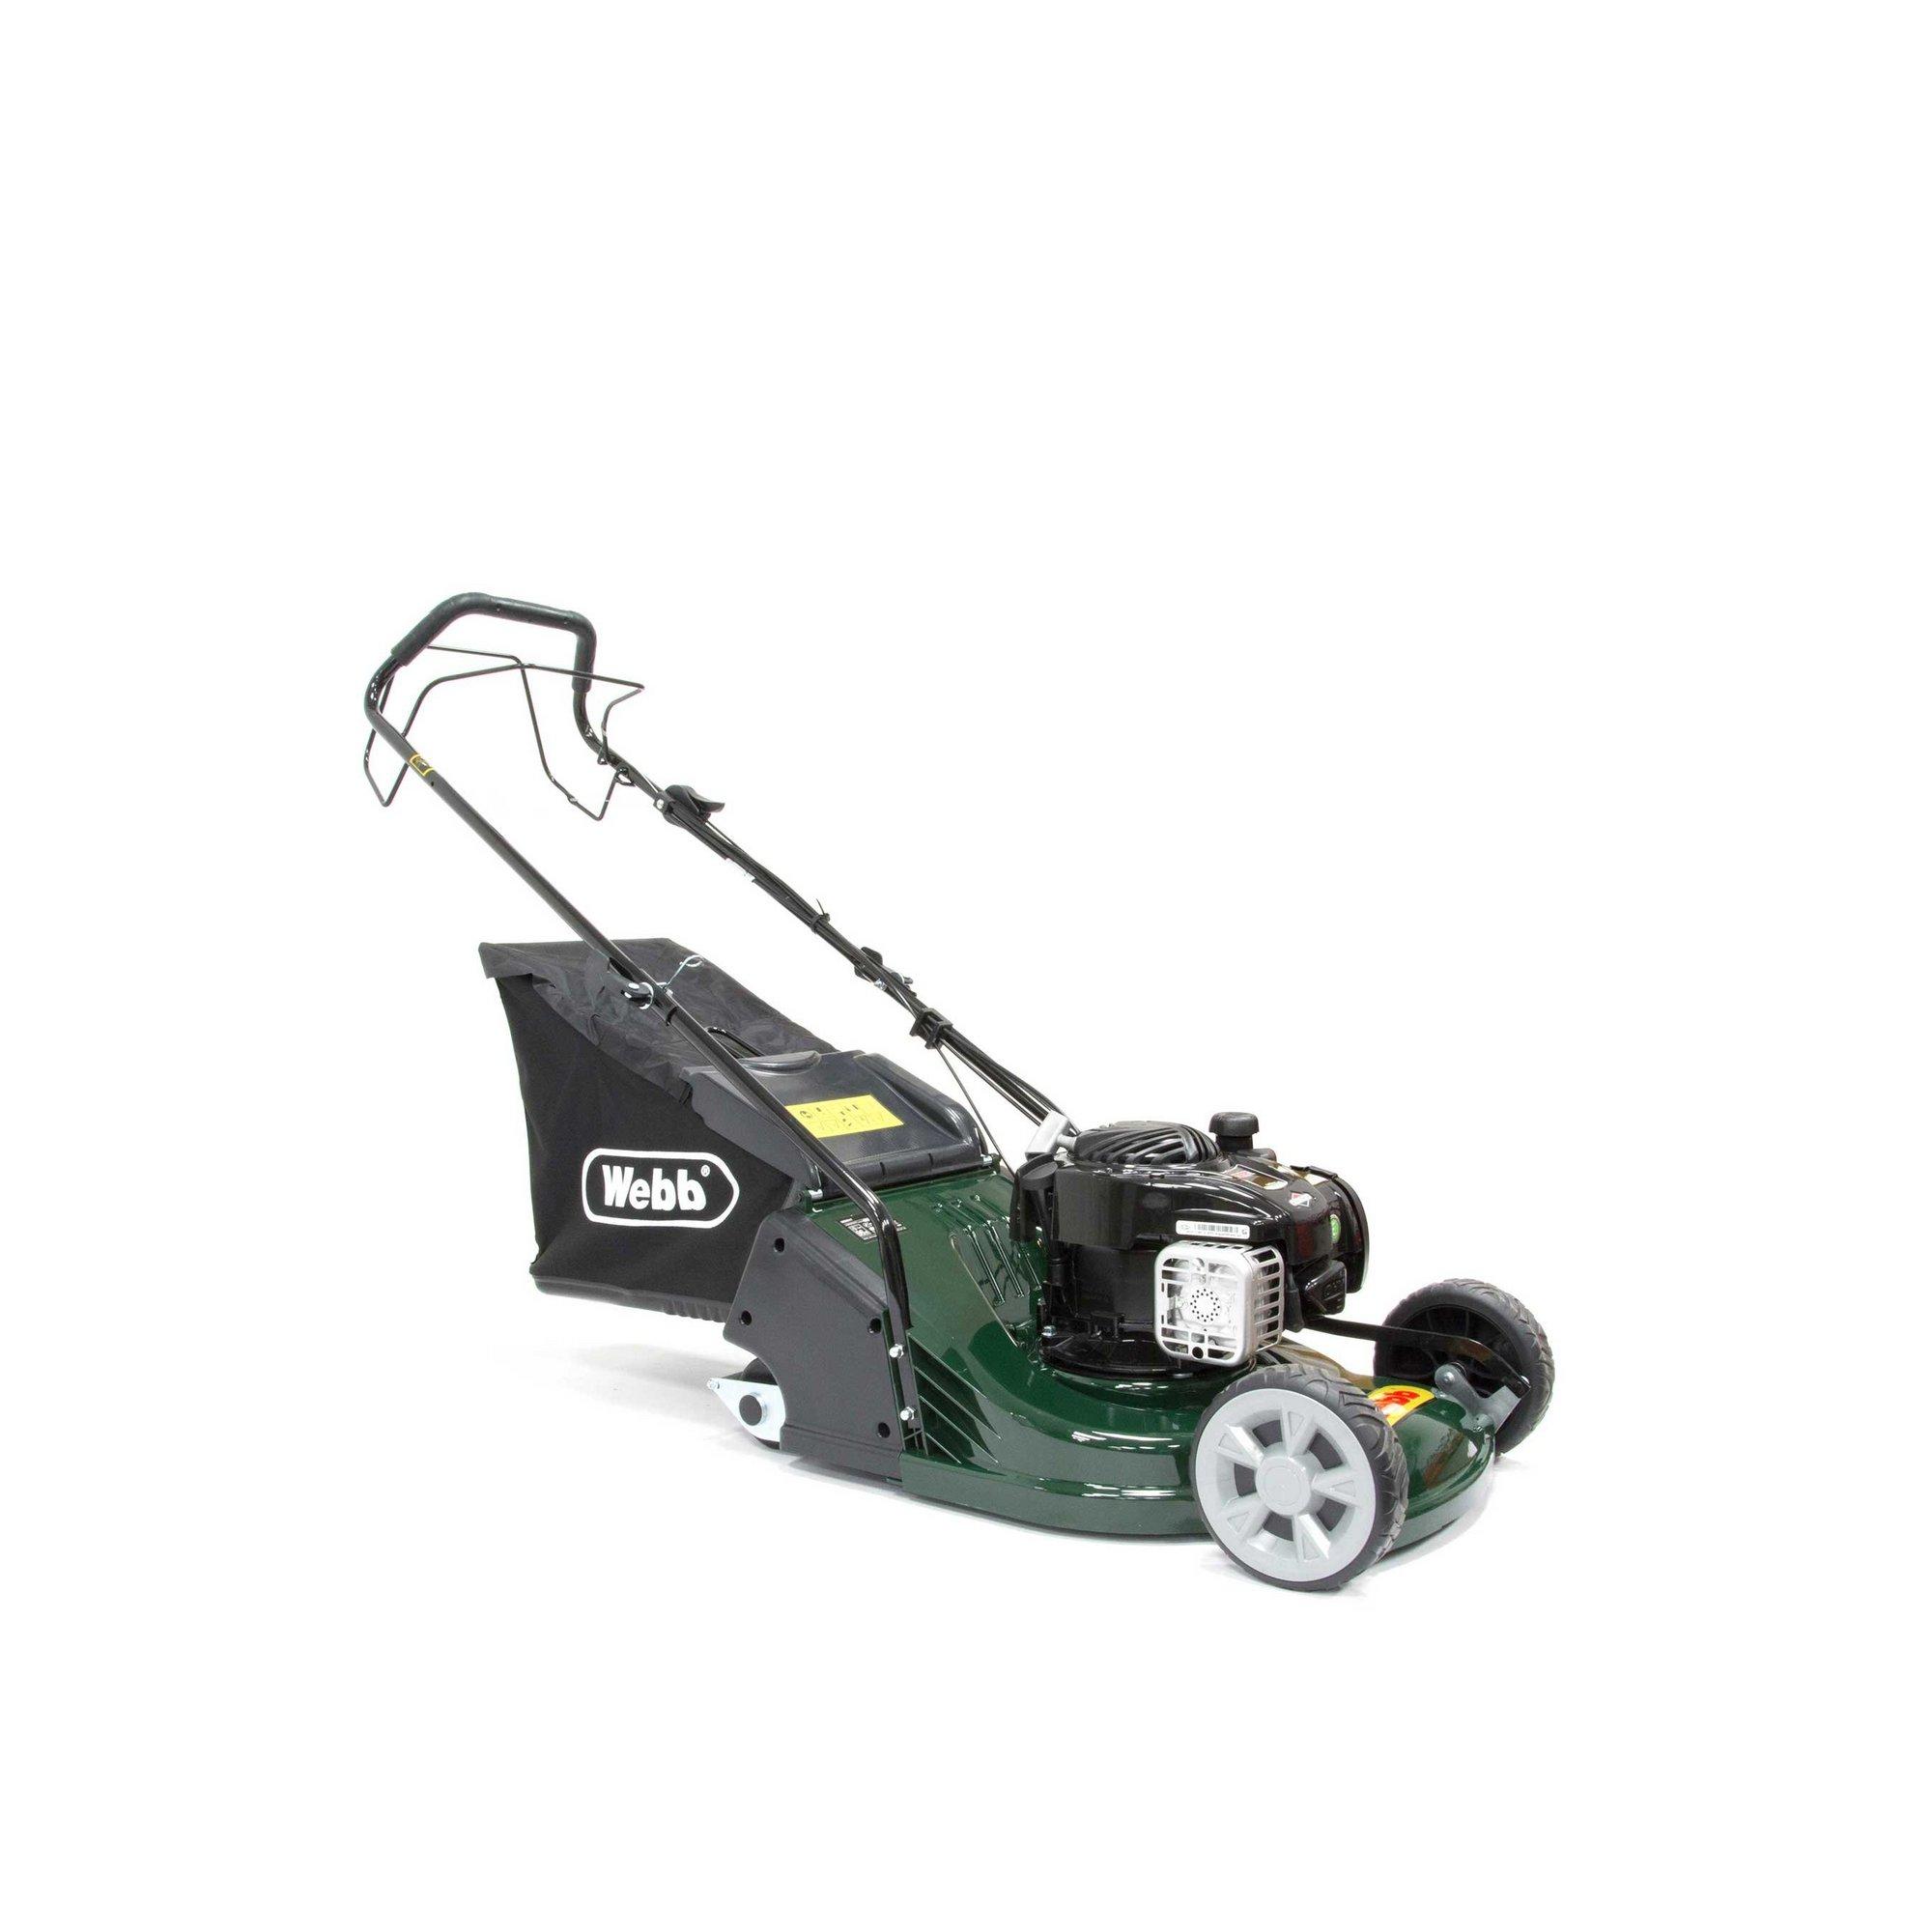 Image of 43cm Self Propelled Petrol Rear Roller Rotary Lawnmower